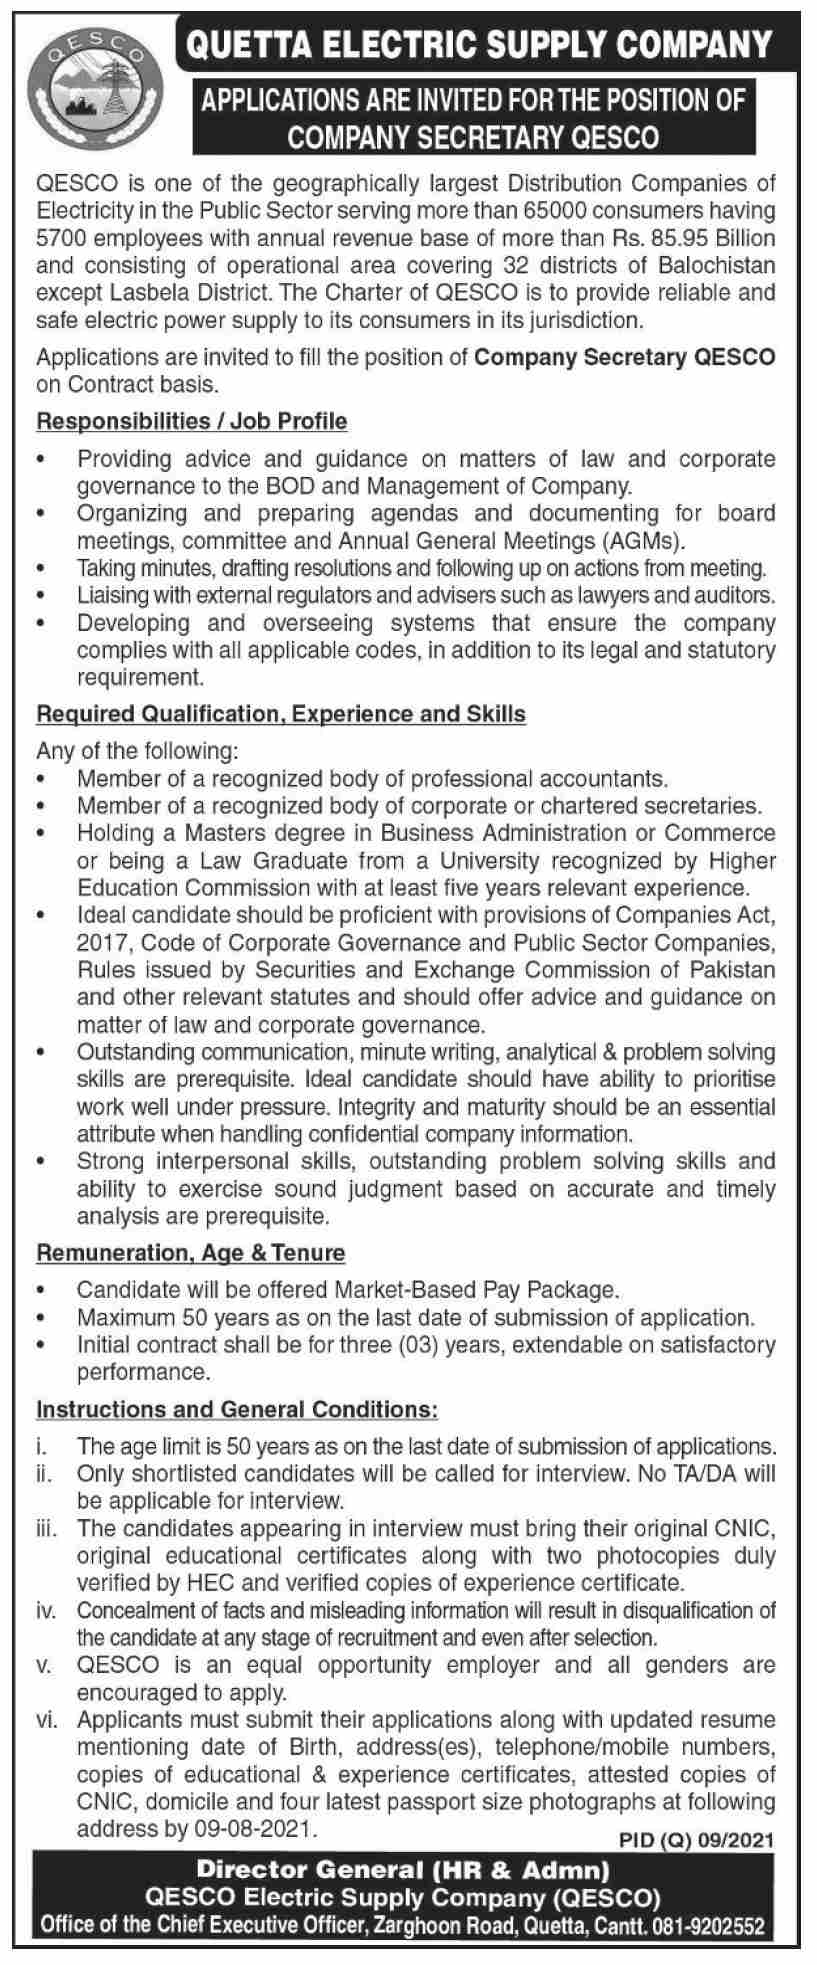 Quetta Electric Supply Company QESCO Company Secretary Jobs